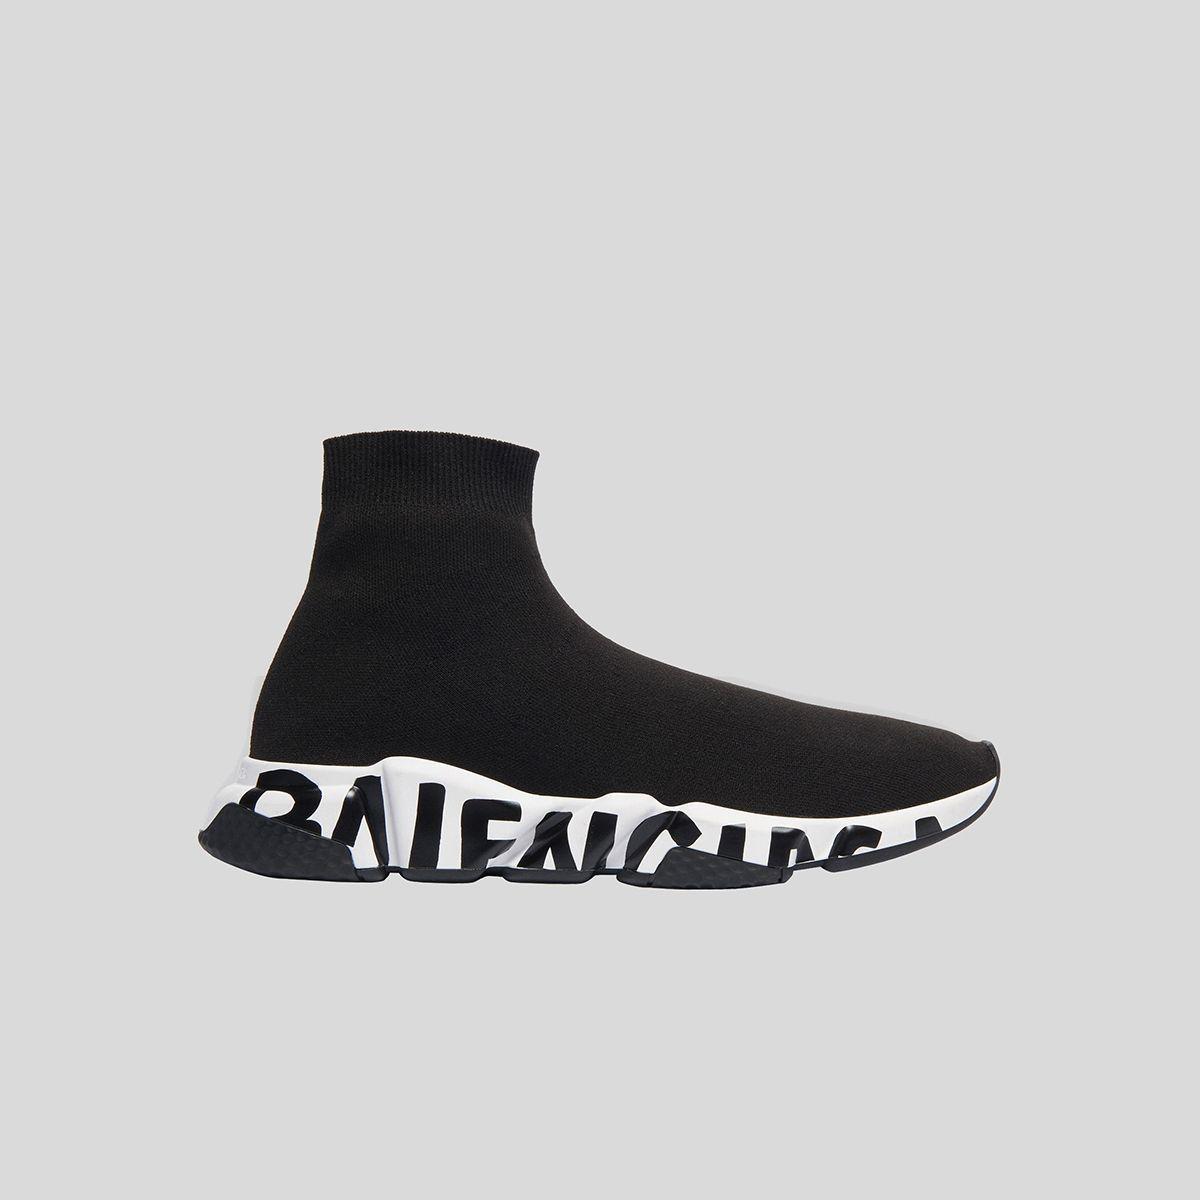 BALENCIAGA バレンシアガ ブラック/ホワイトスピードスニーカーグラフィティ Black/White Speed Sneaker Graffiti